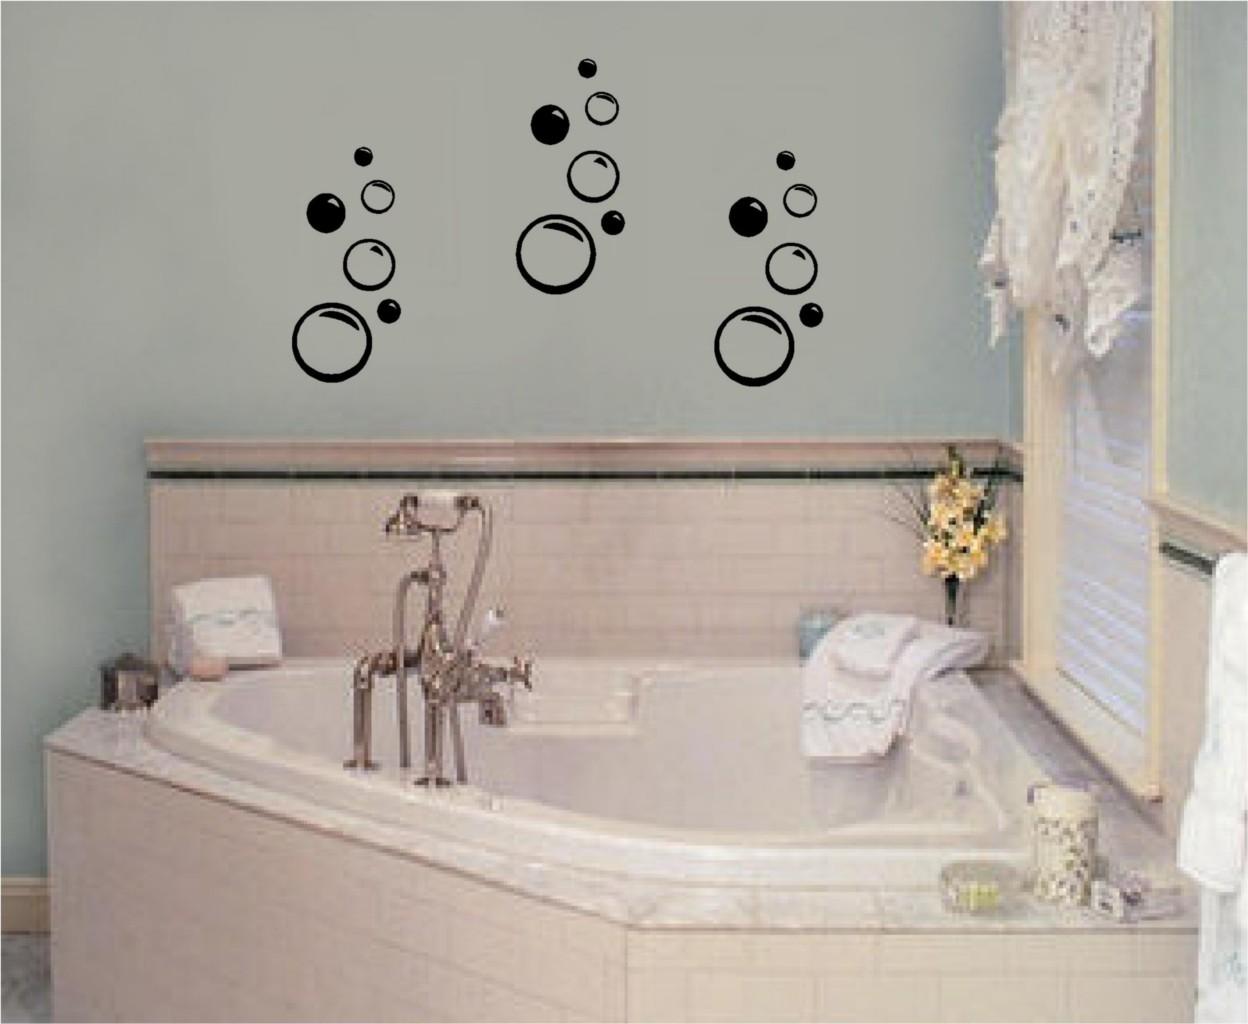 Bathroom Wall Decor: Bubbles Vinyl Wall Decal Stickers Decor Bathroom Art